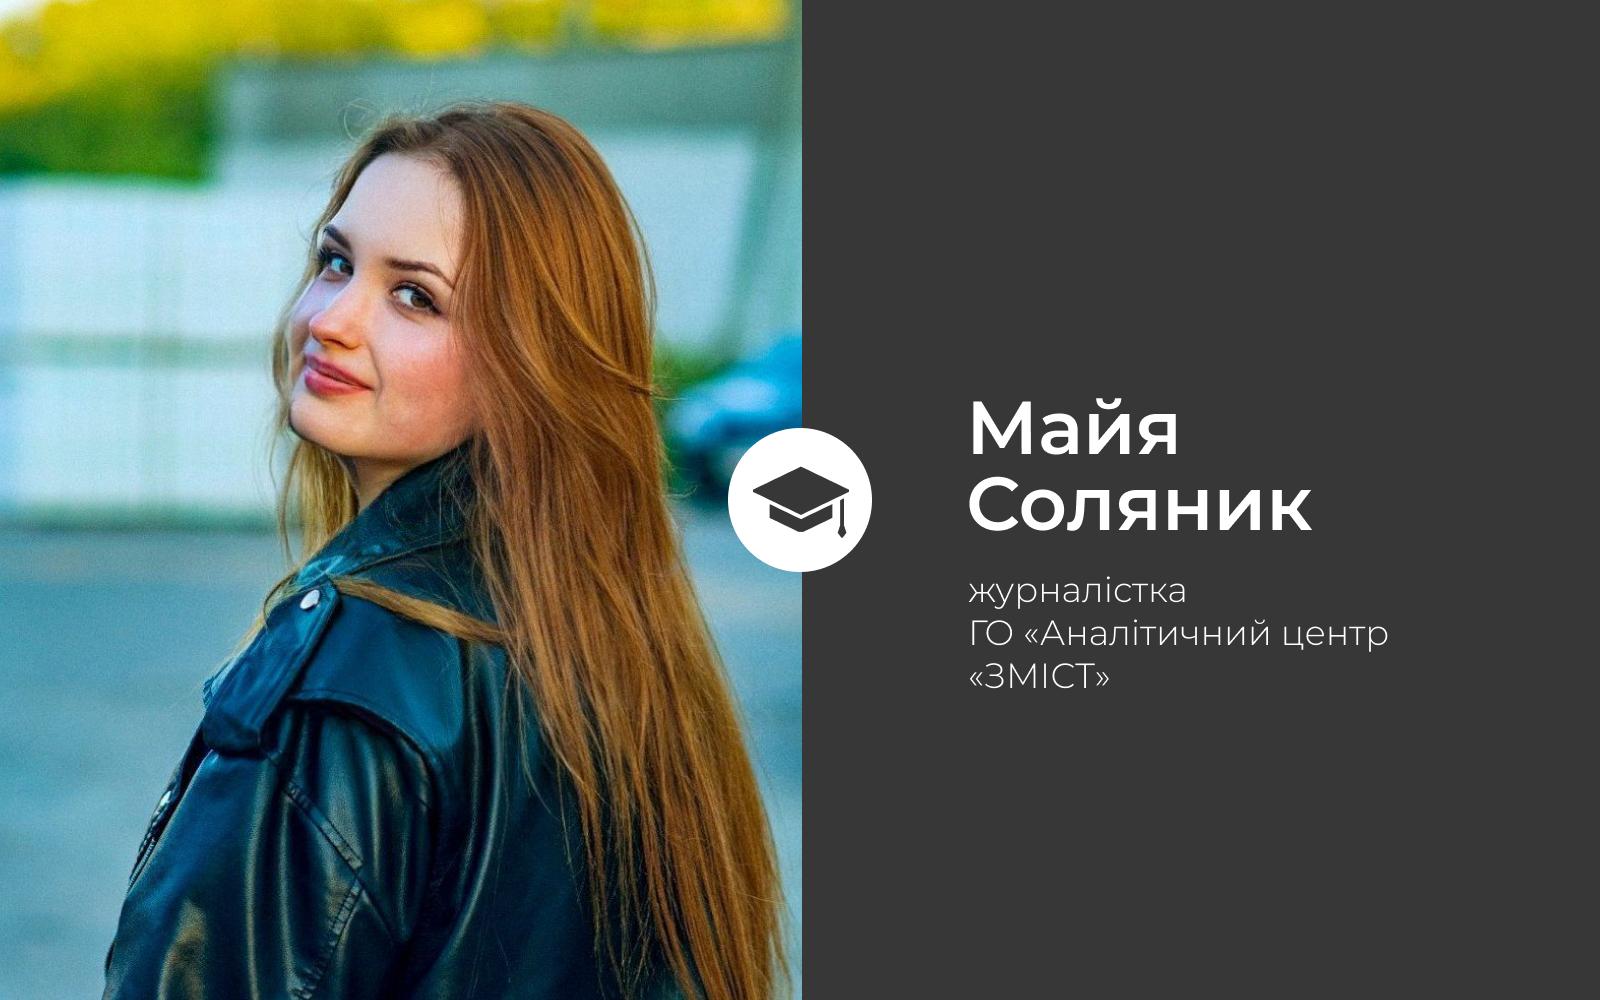 Майя Соляник_2 (2)